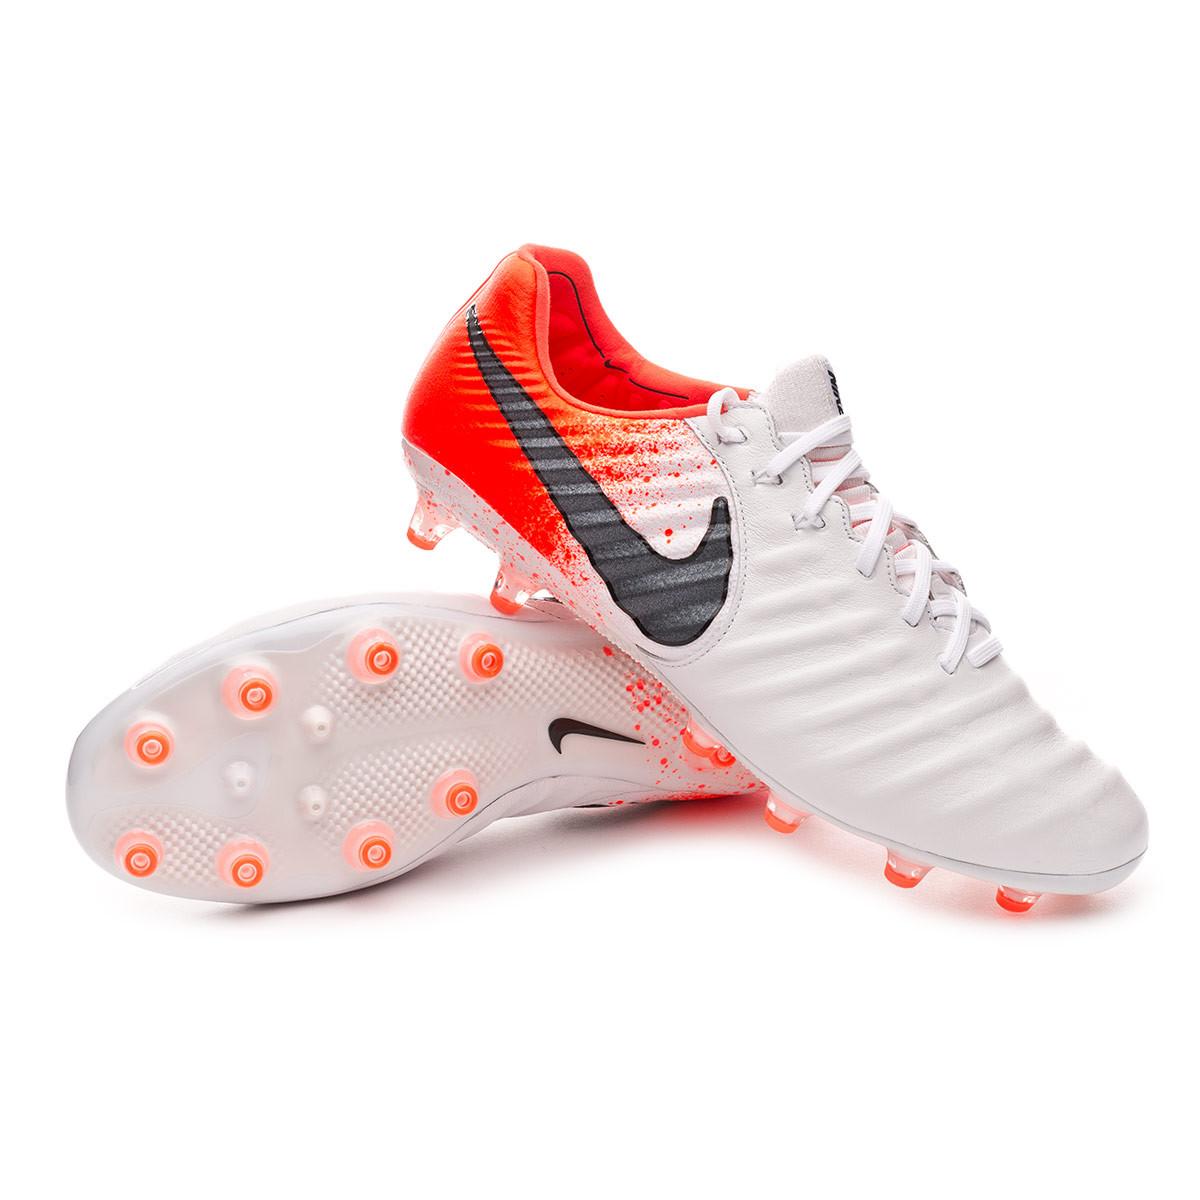 pintar difícil Fragante  Football Boots Nike Tiempo Legend VII Elite AG-Pro White-Black-Hyper  crimson - Football store Fútbol Emotion